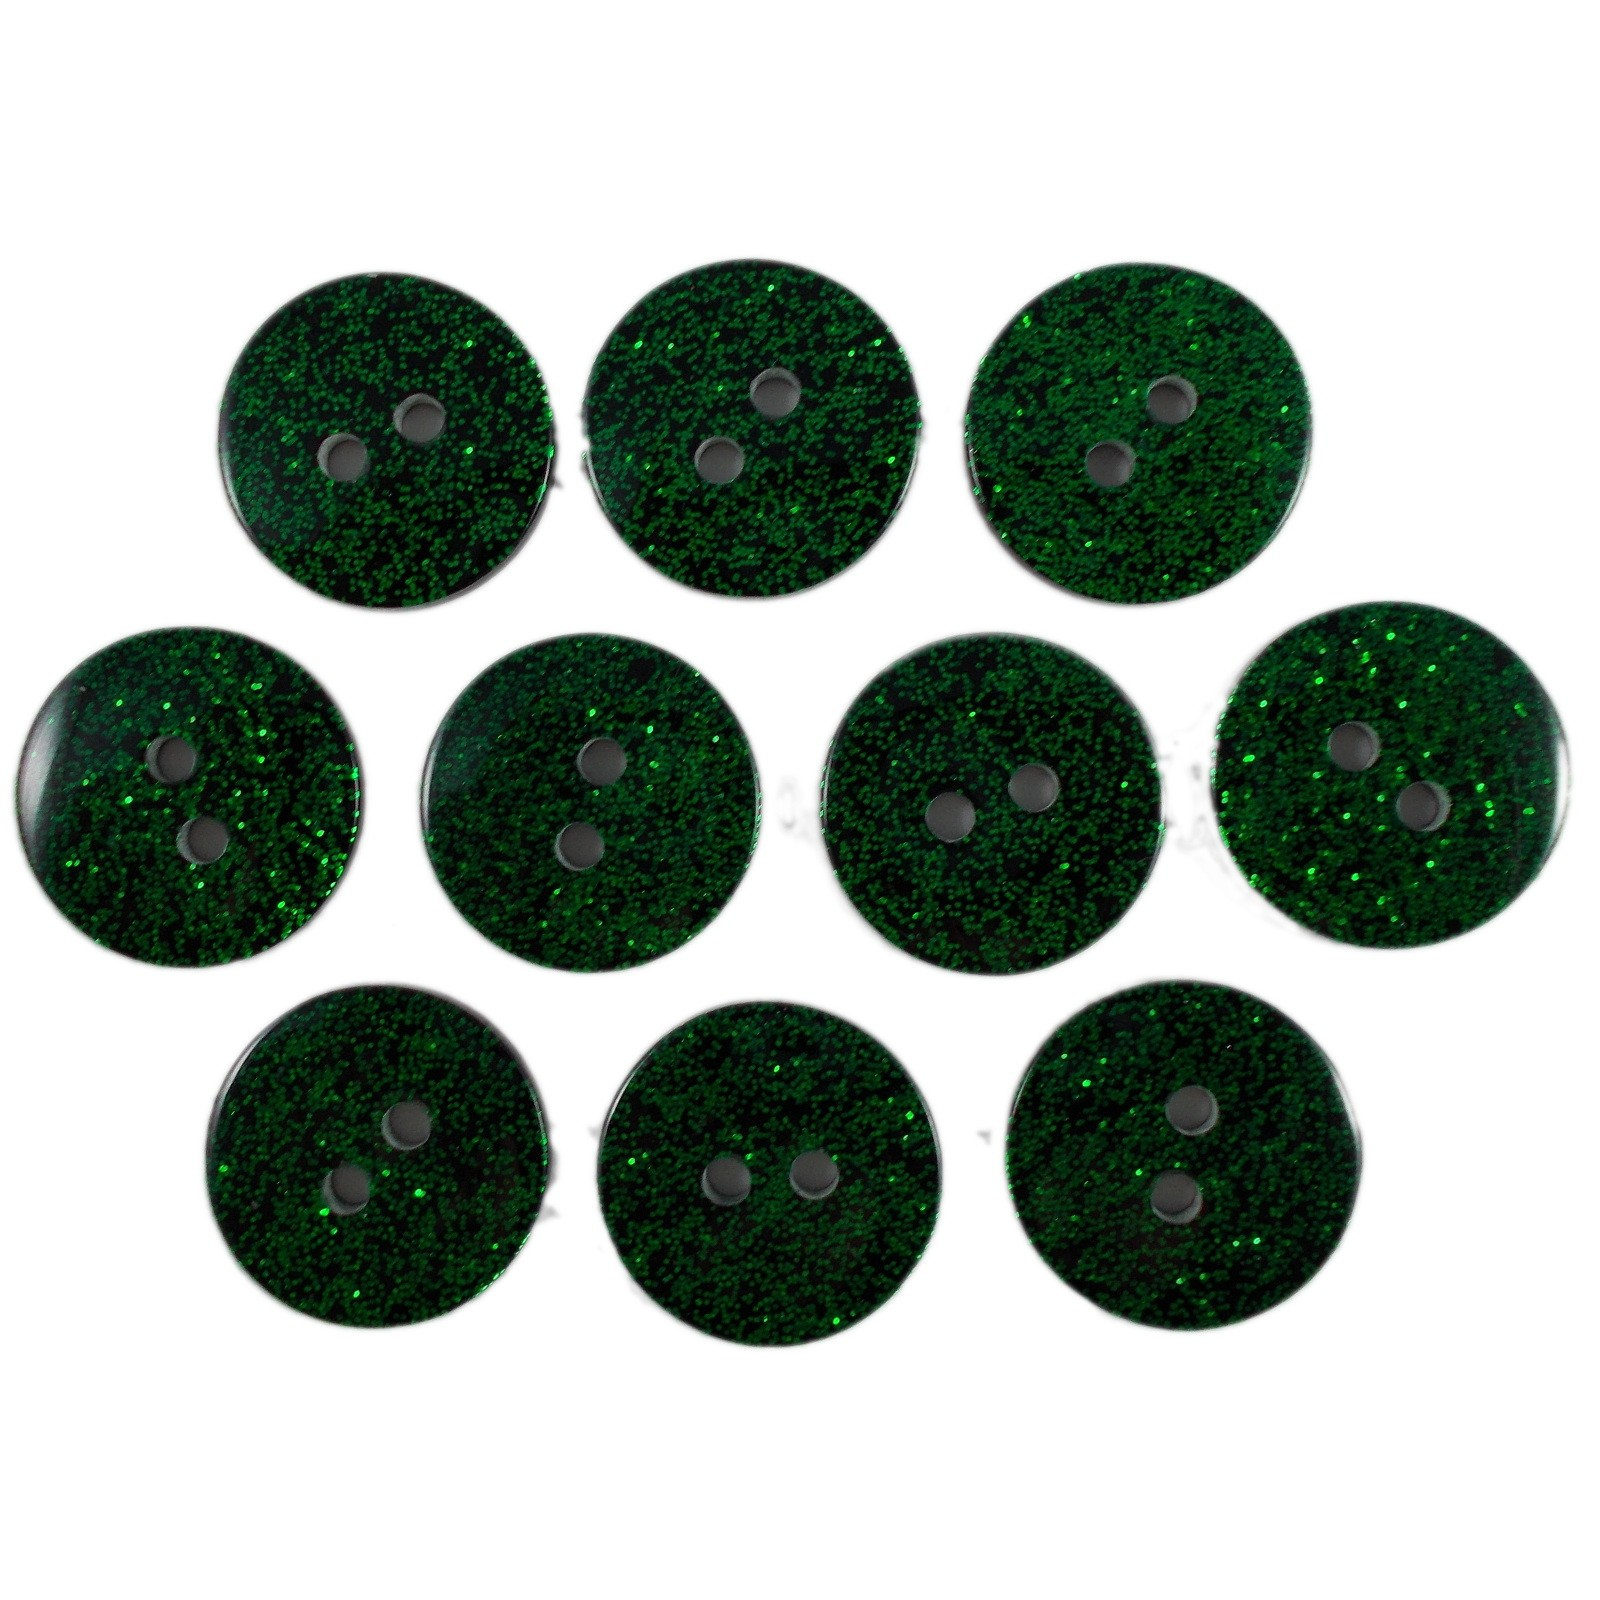 Colour Dark Glitter Buttons 17mm Green Pack of 10